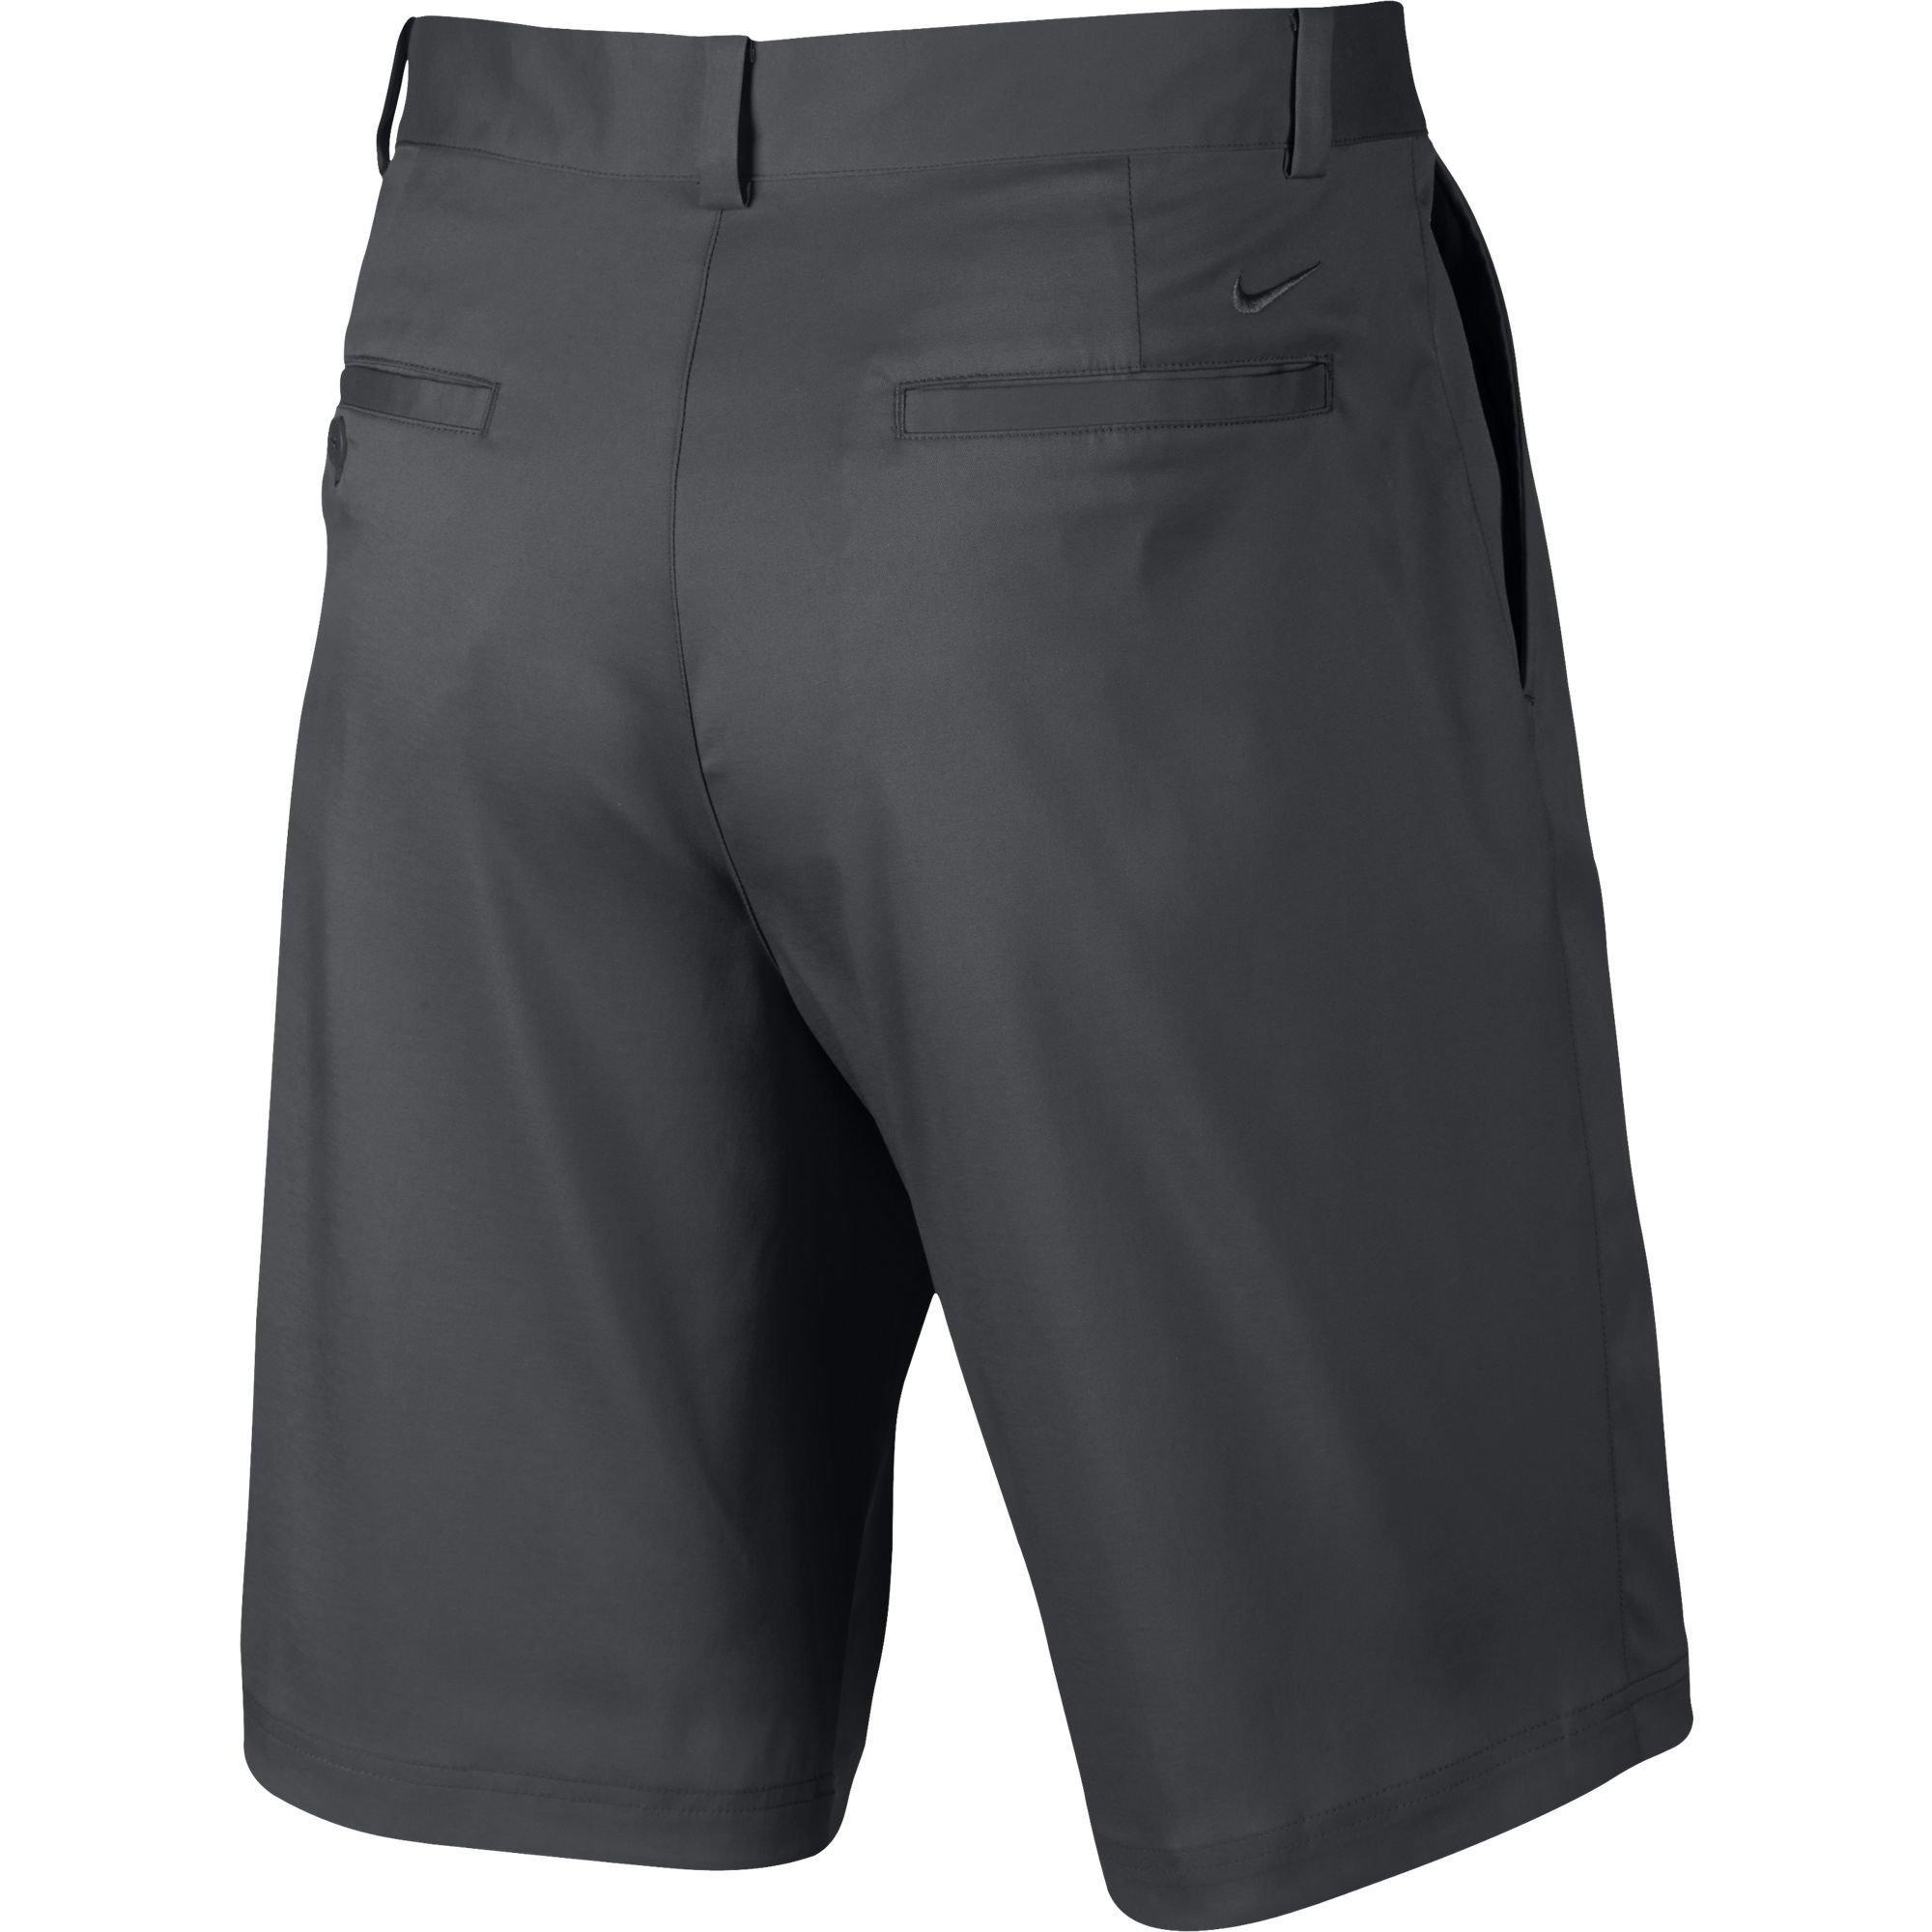 Nike Golf Flat Front Short Dark Grey 38 by NIKE (Image #2)